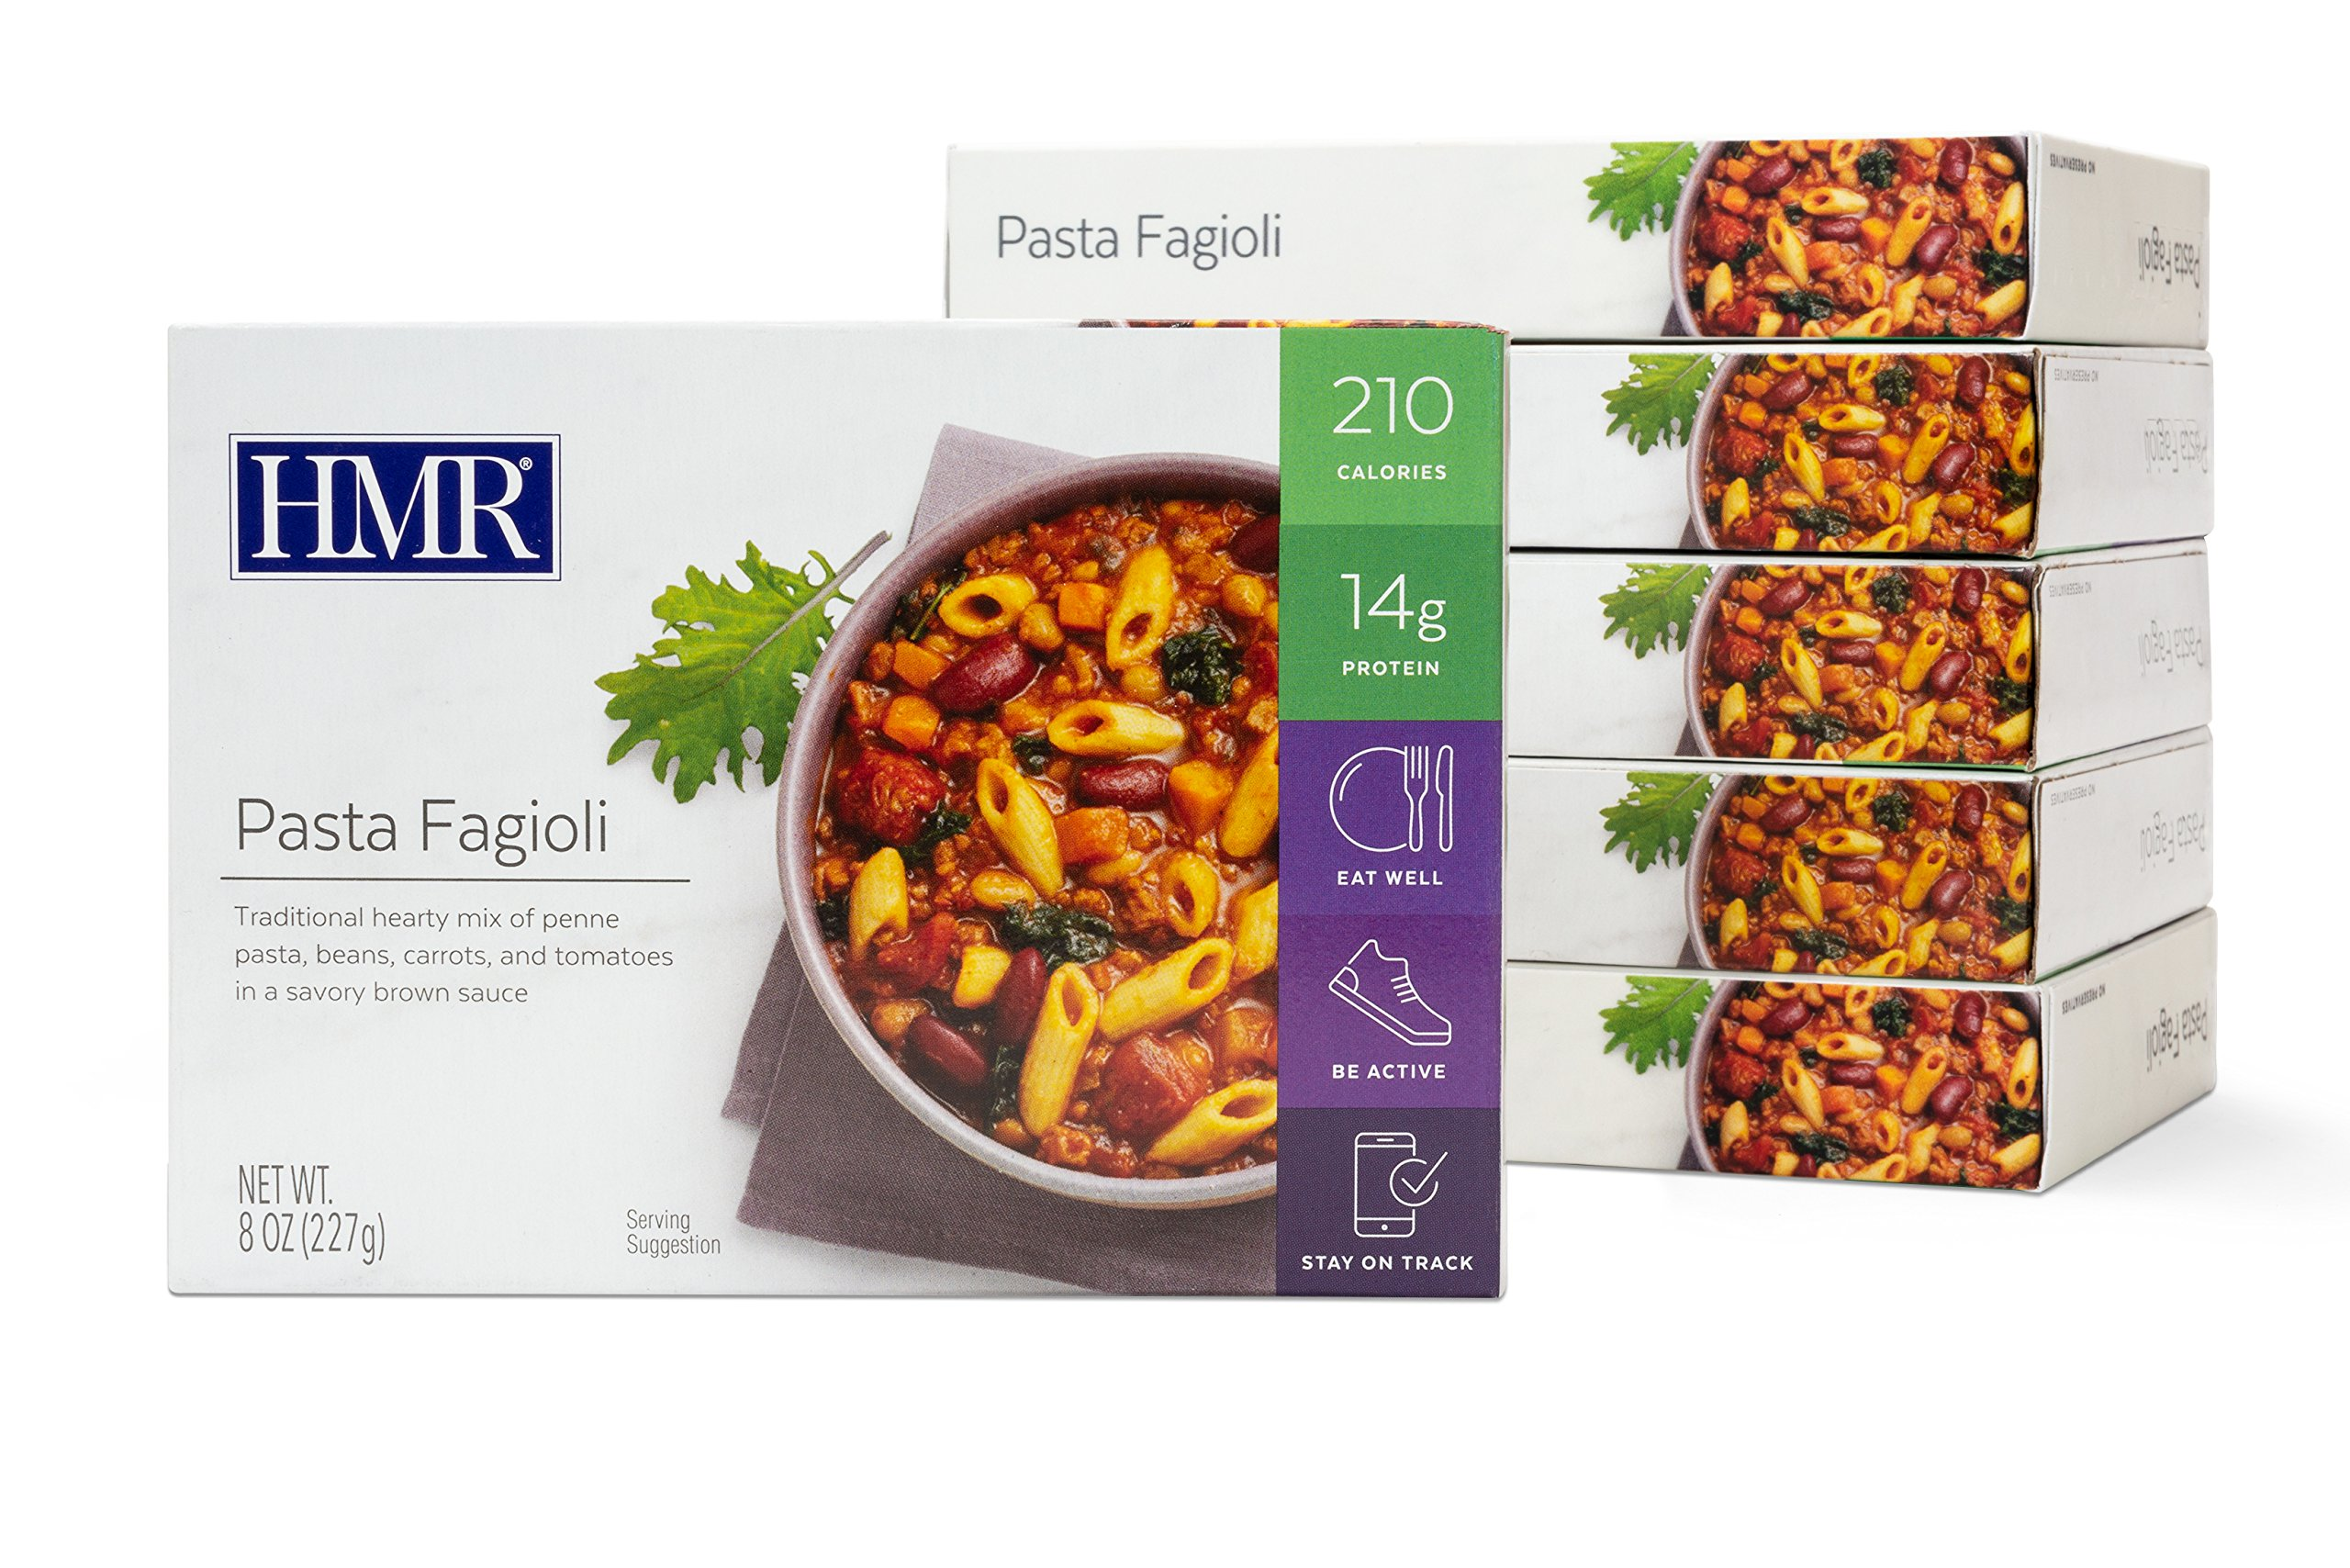 HMR Pasta Fagioli Entree, 8 oz. Servings, 6 Count